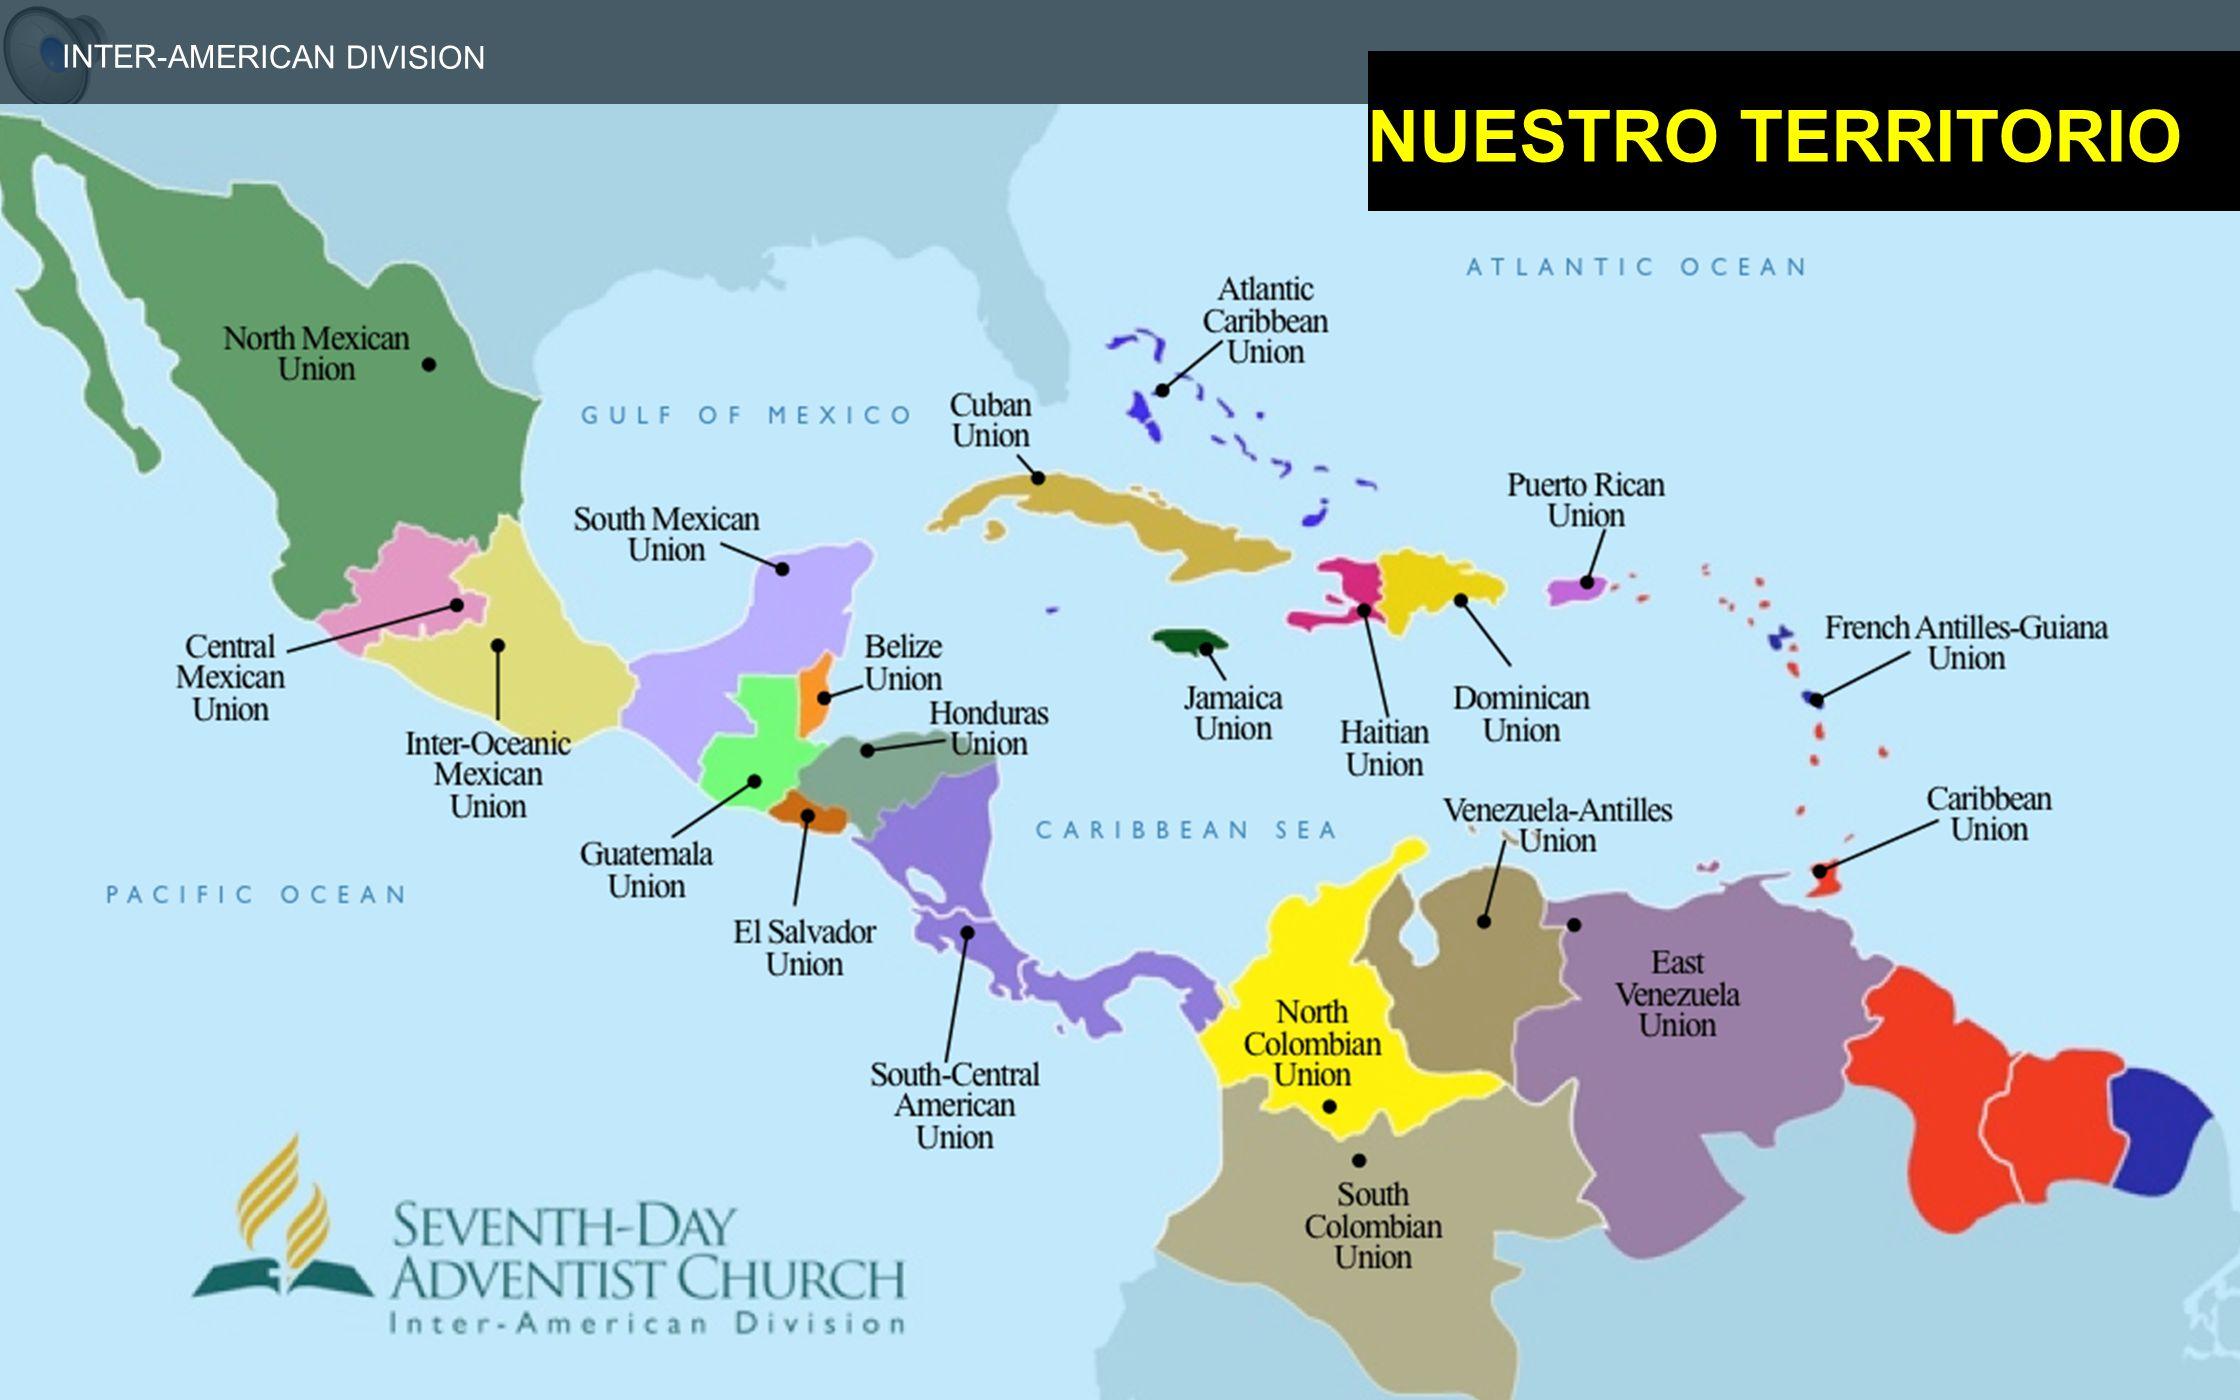 INTER-AMERICAN DIVISION NUESTRO TERRITORIO